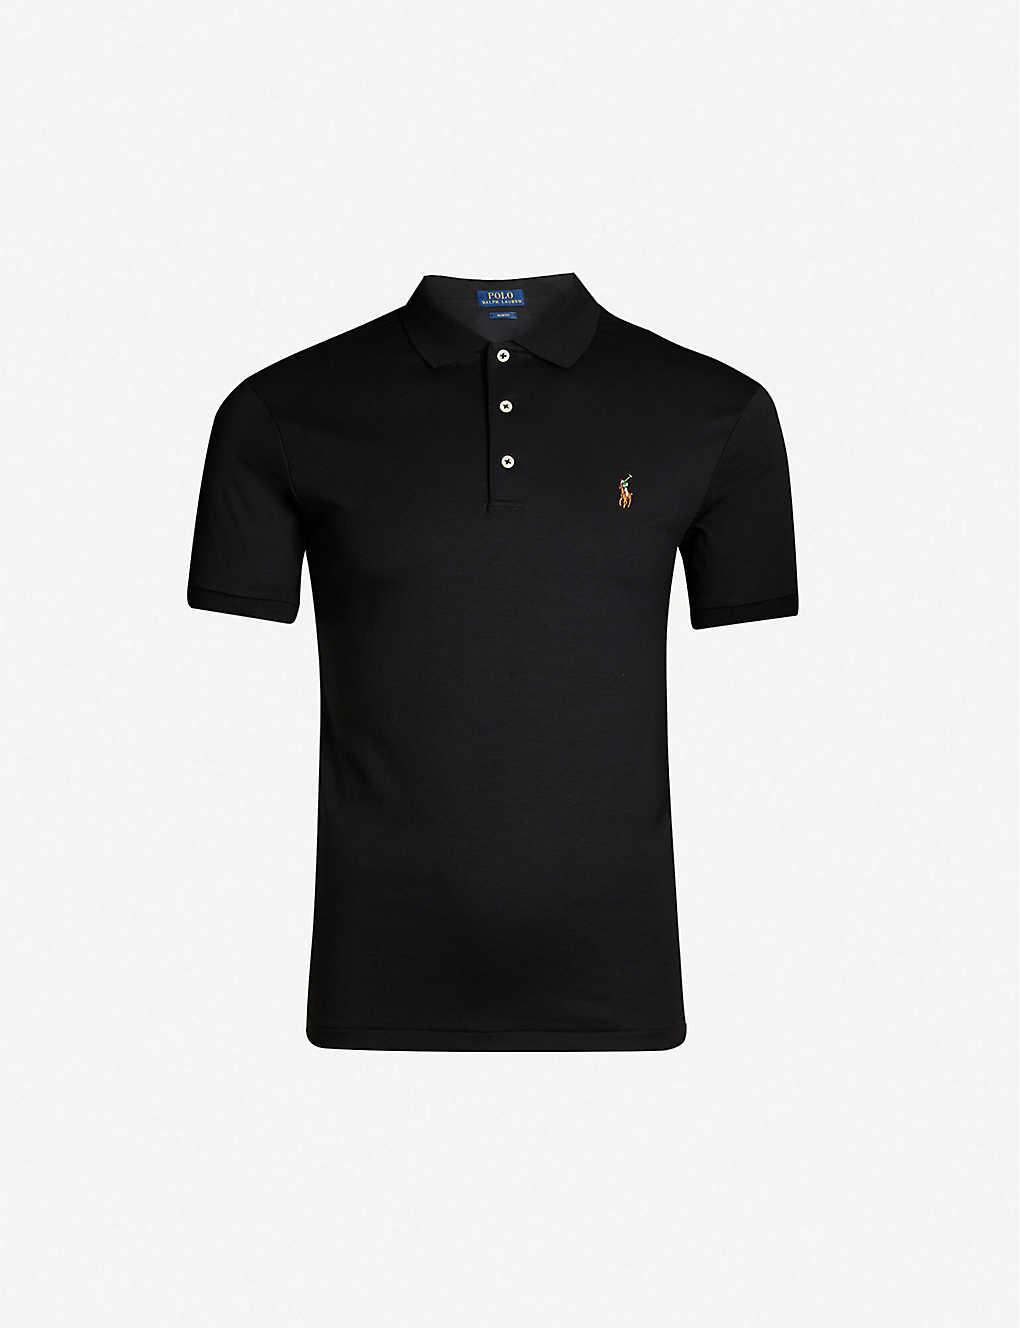 a82881d93adeb0 POLO RALPH LAUREN - Pima Soft Touch cotton polo shirt | Selfridges.com